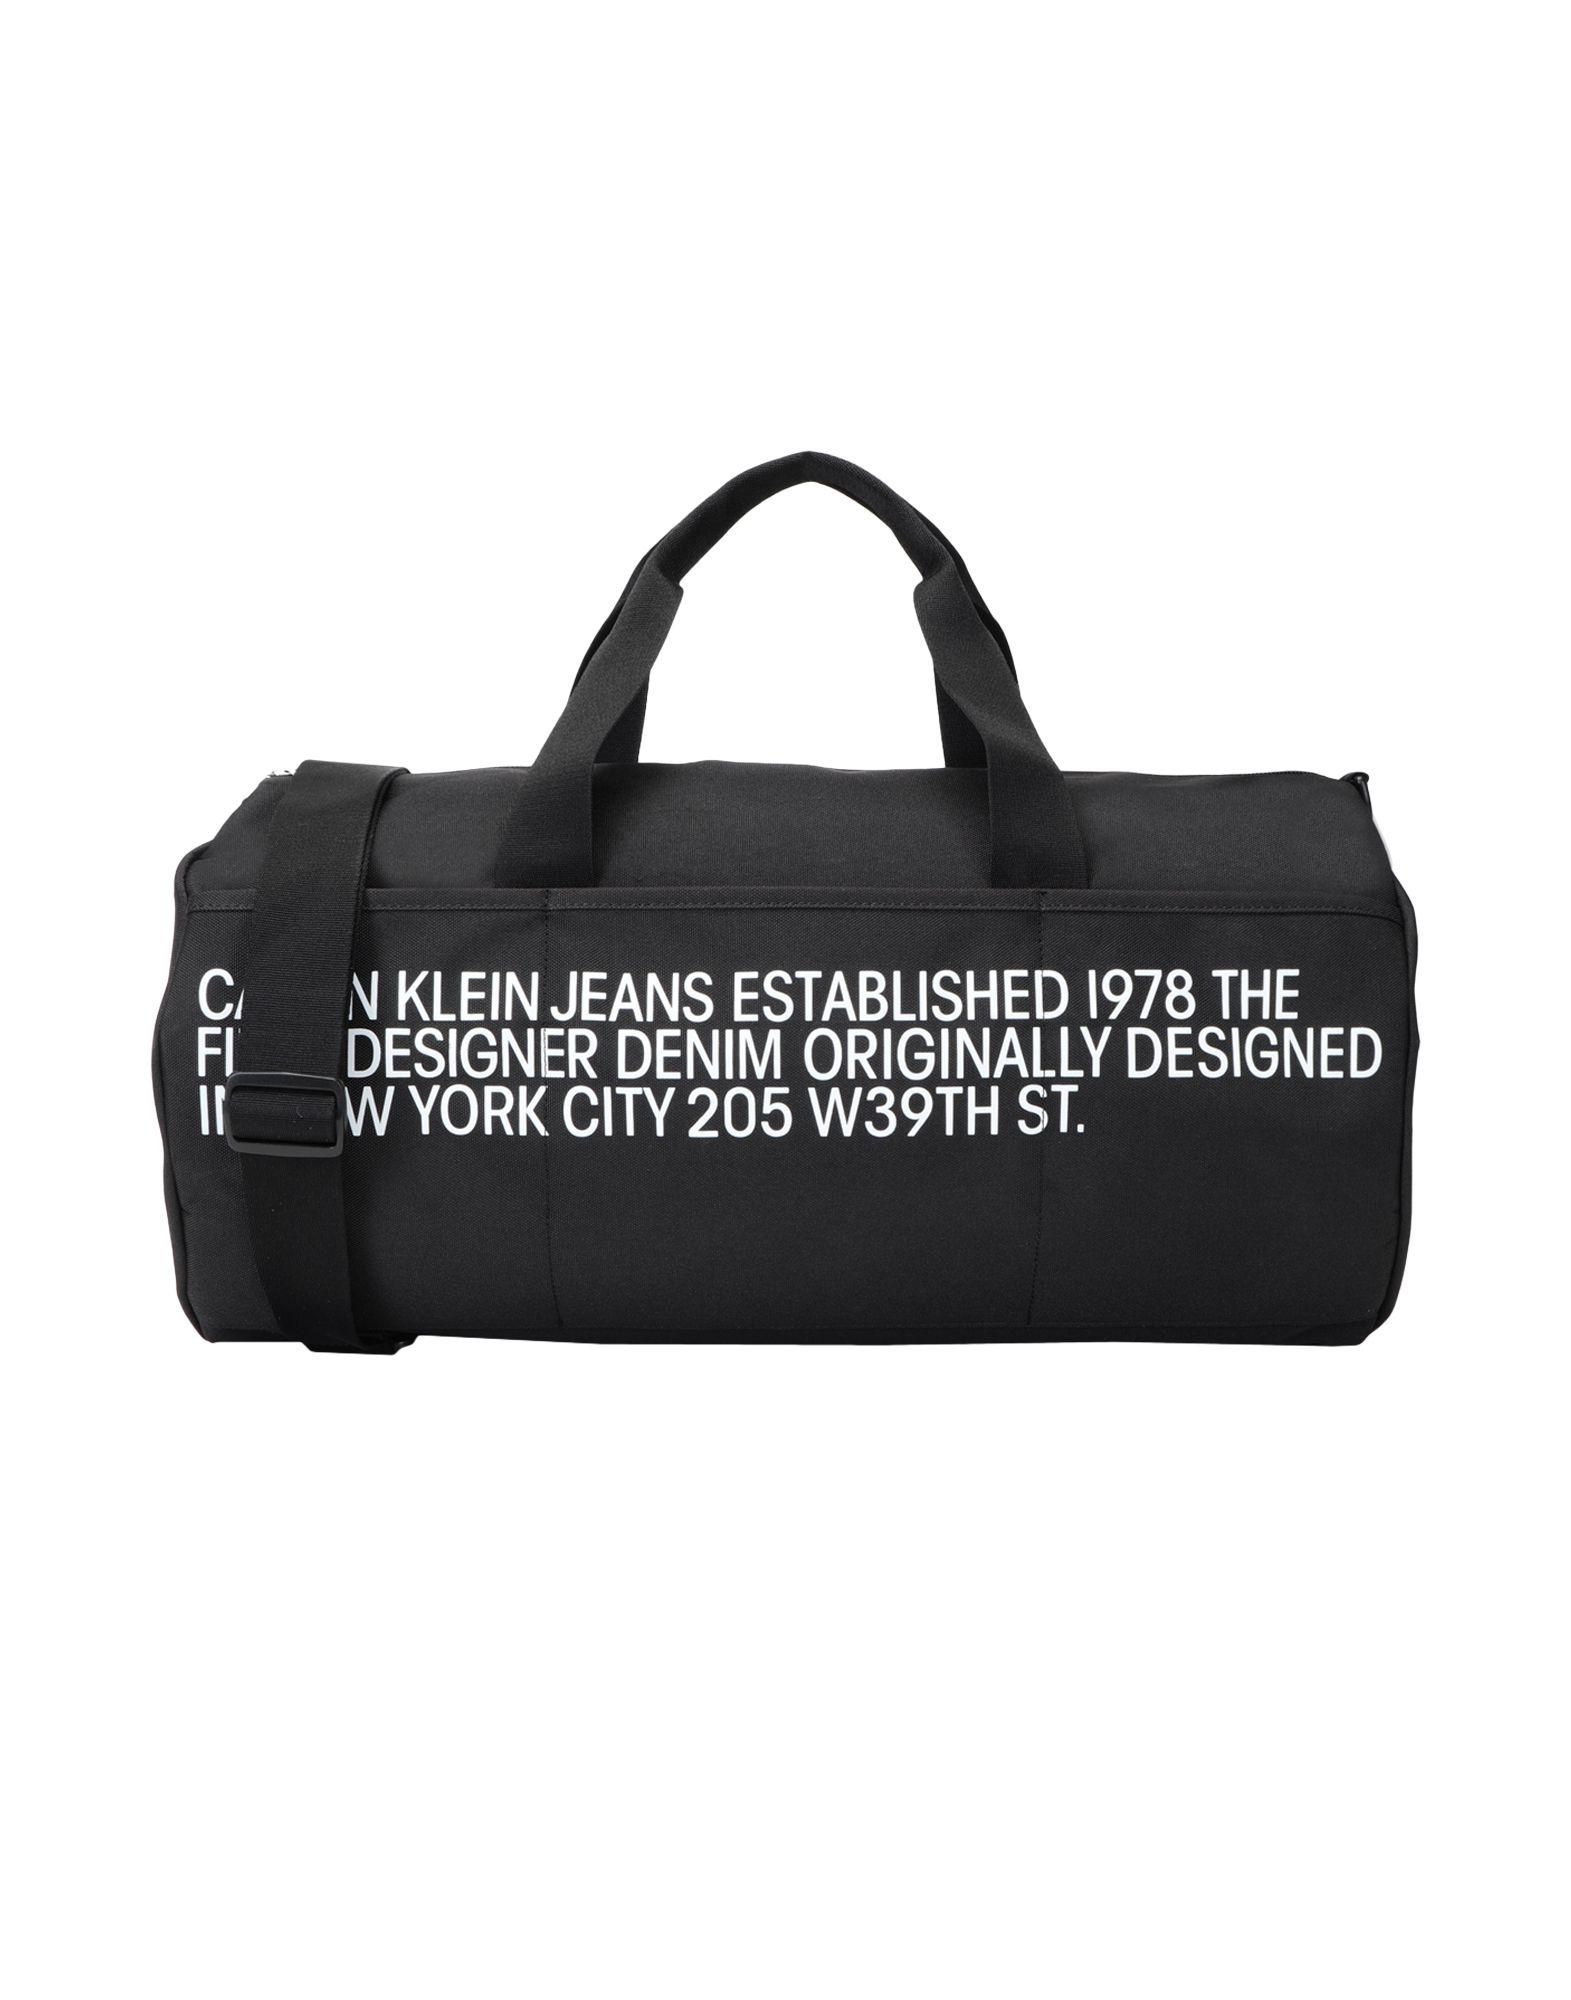 CALVIN KLEIN JEANS メンズ 旅行バッグ BARREL ブラック